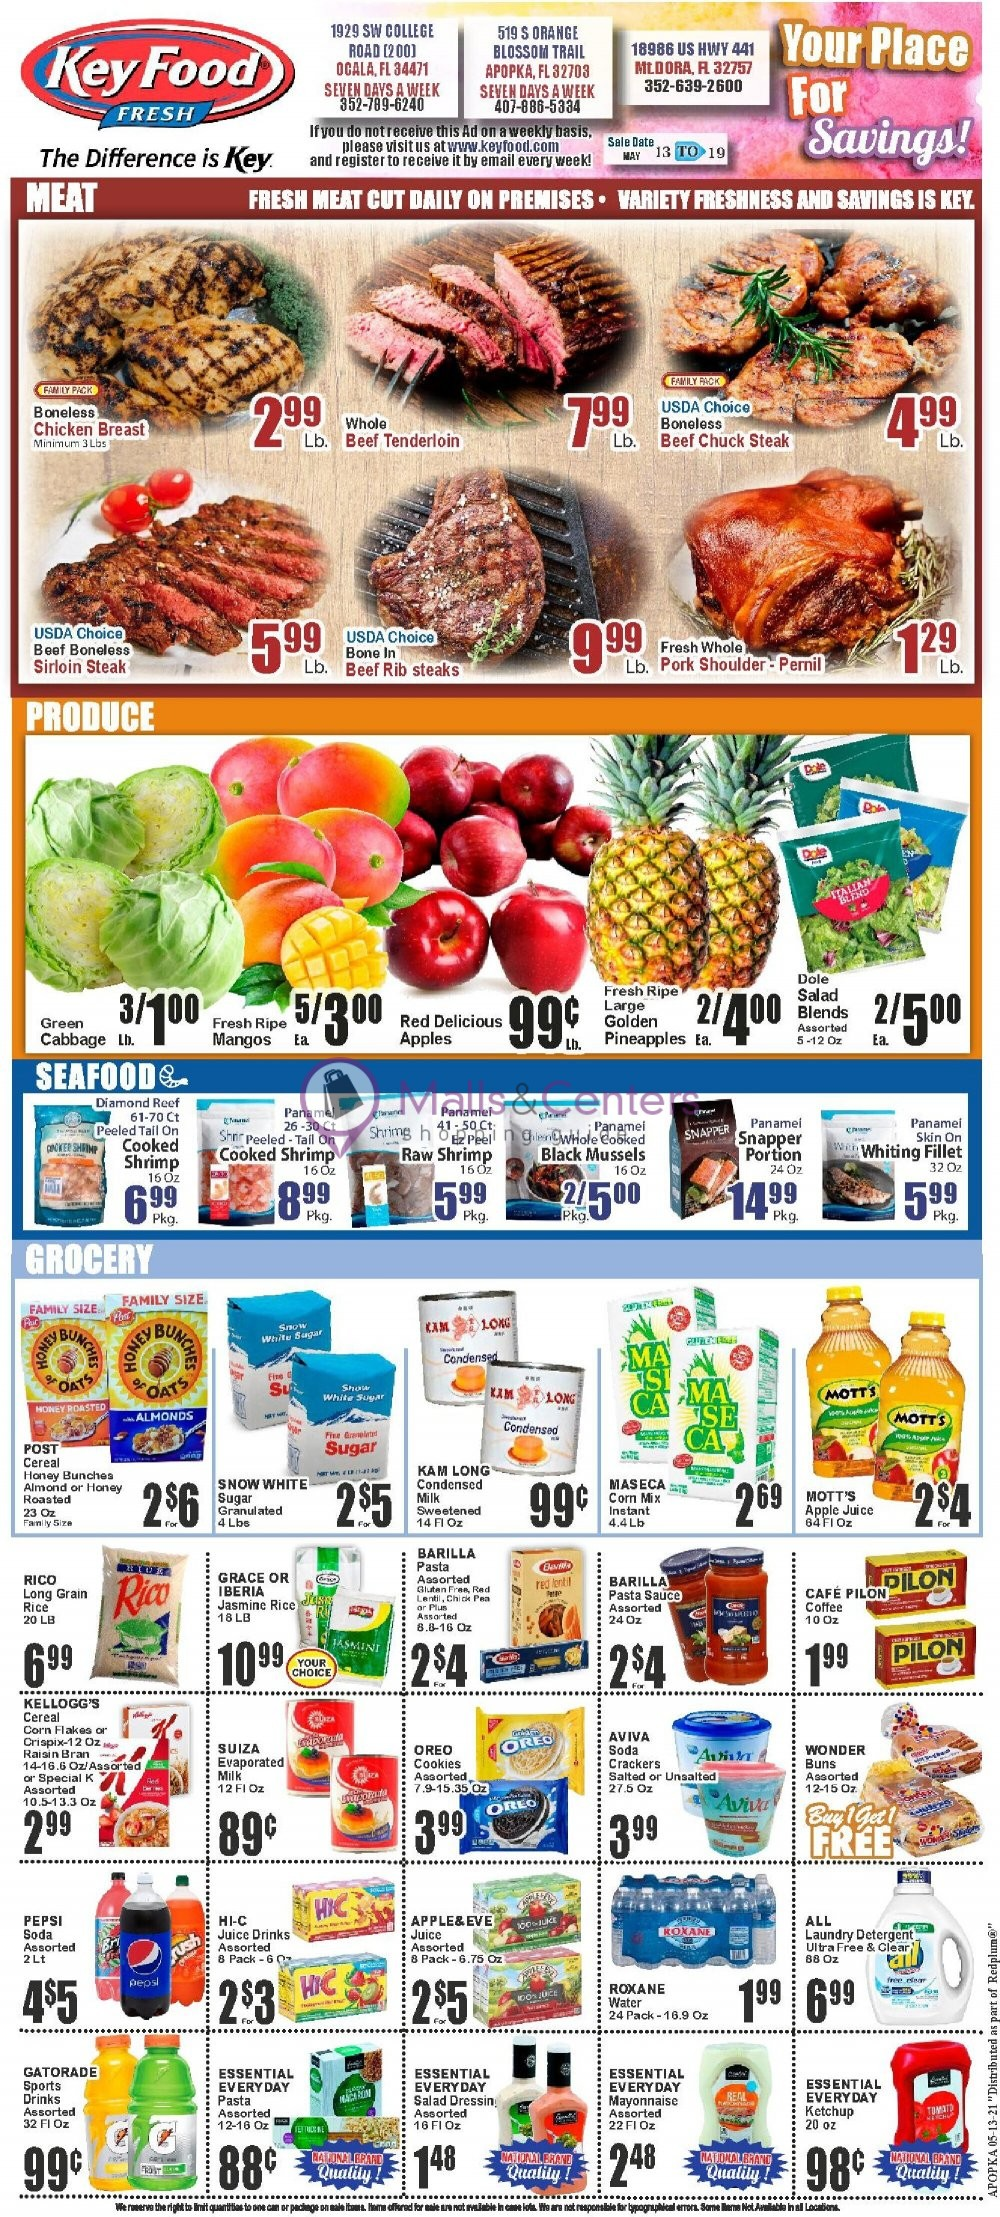 weekly ads Key Food - page 1 - mallscenters.com